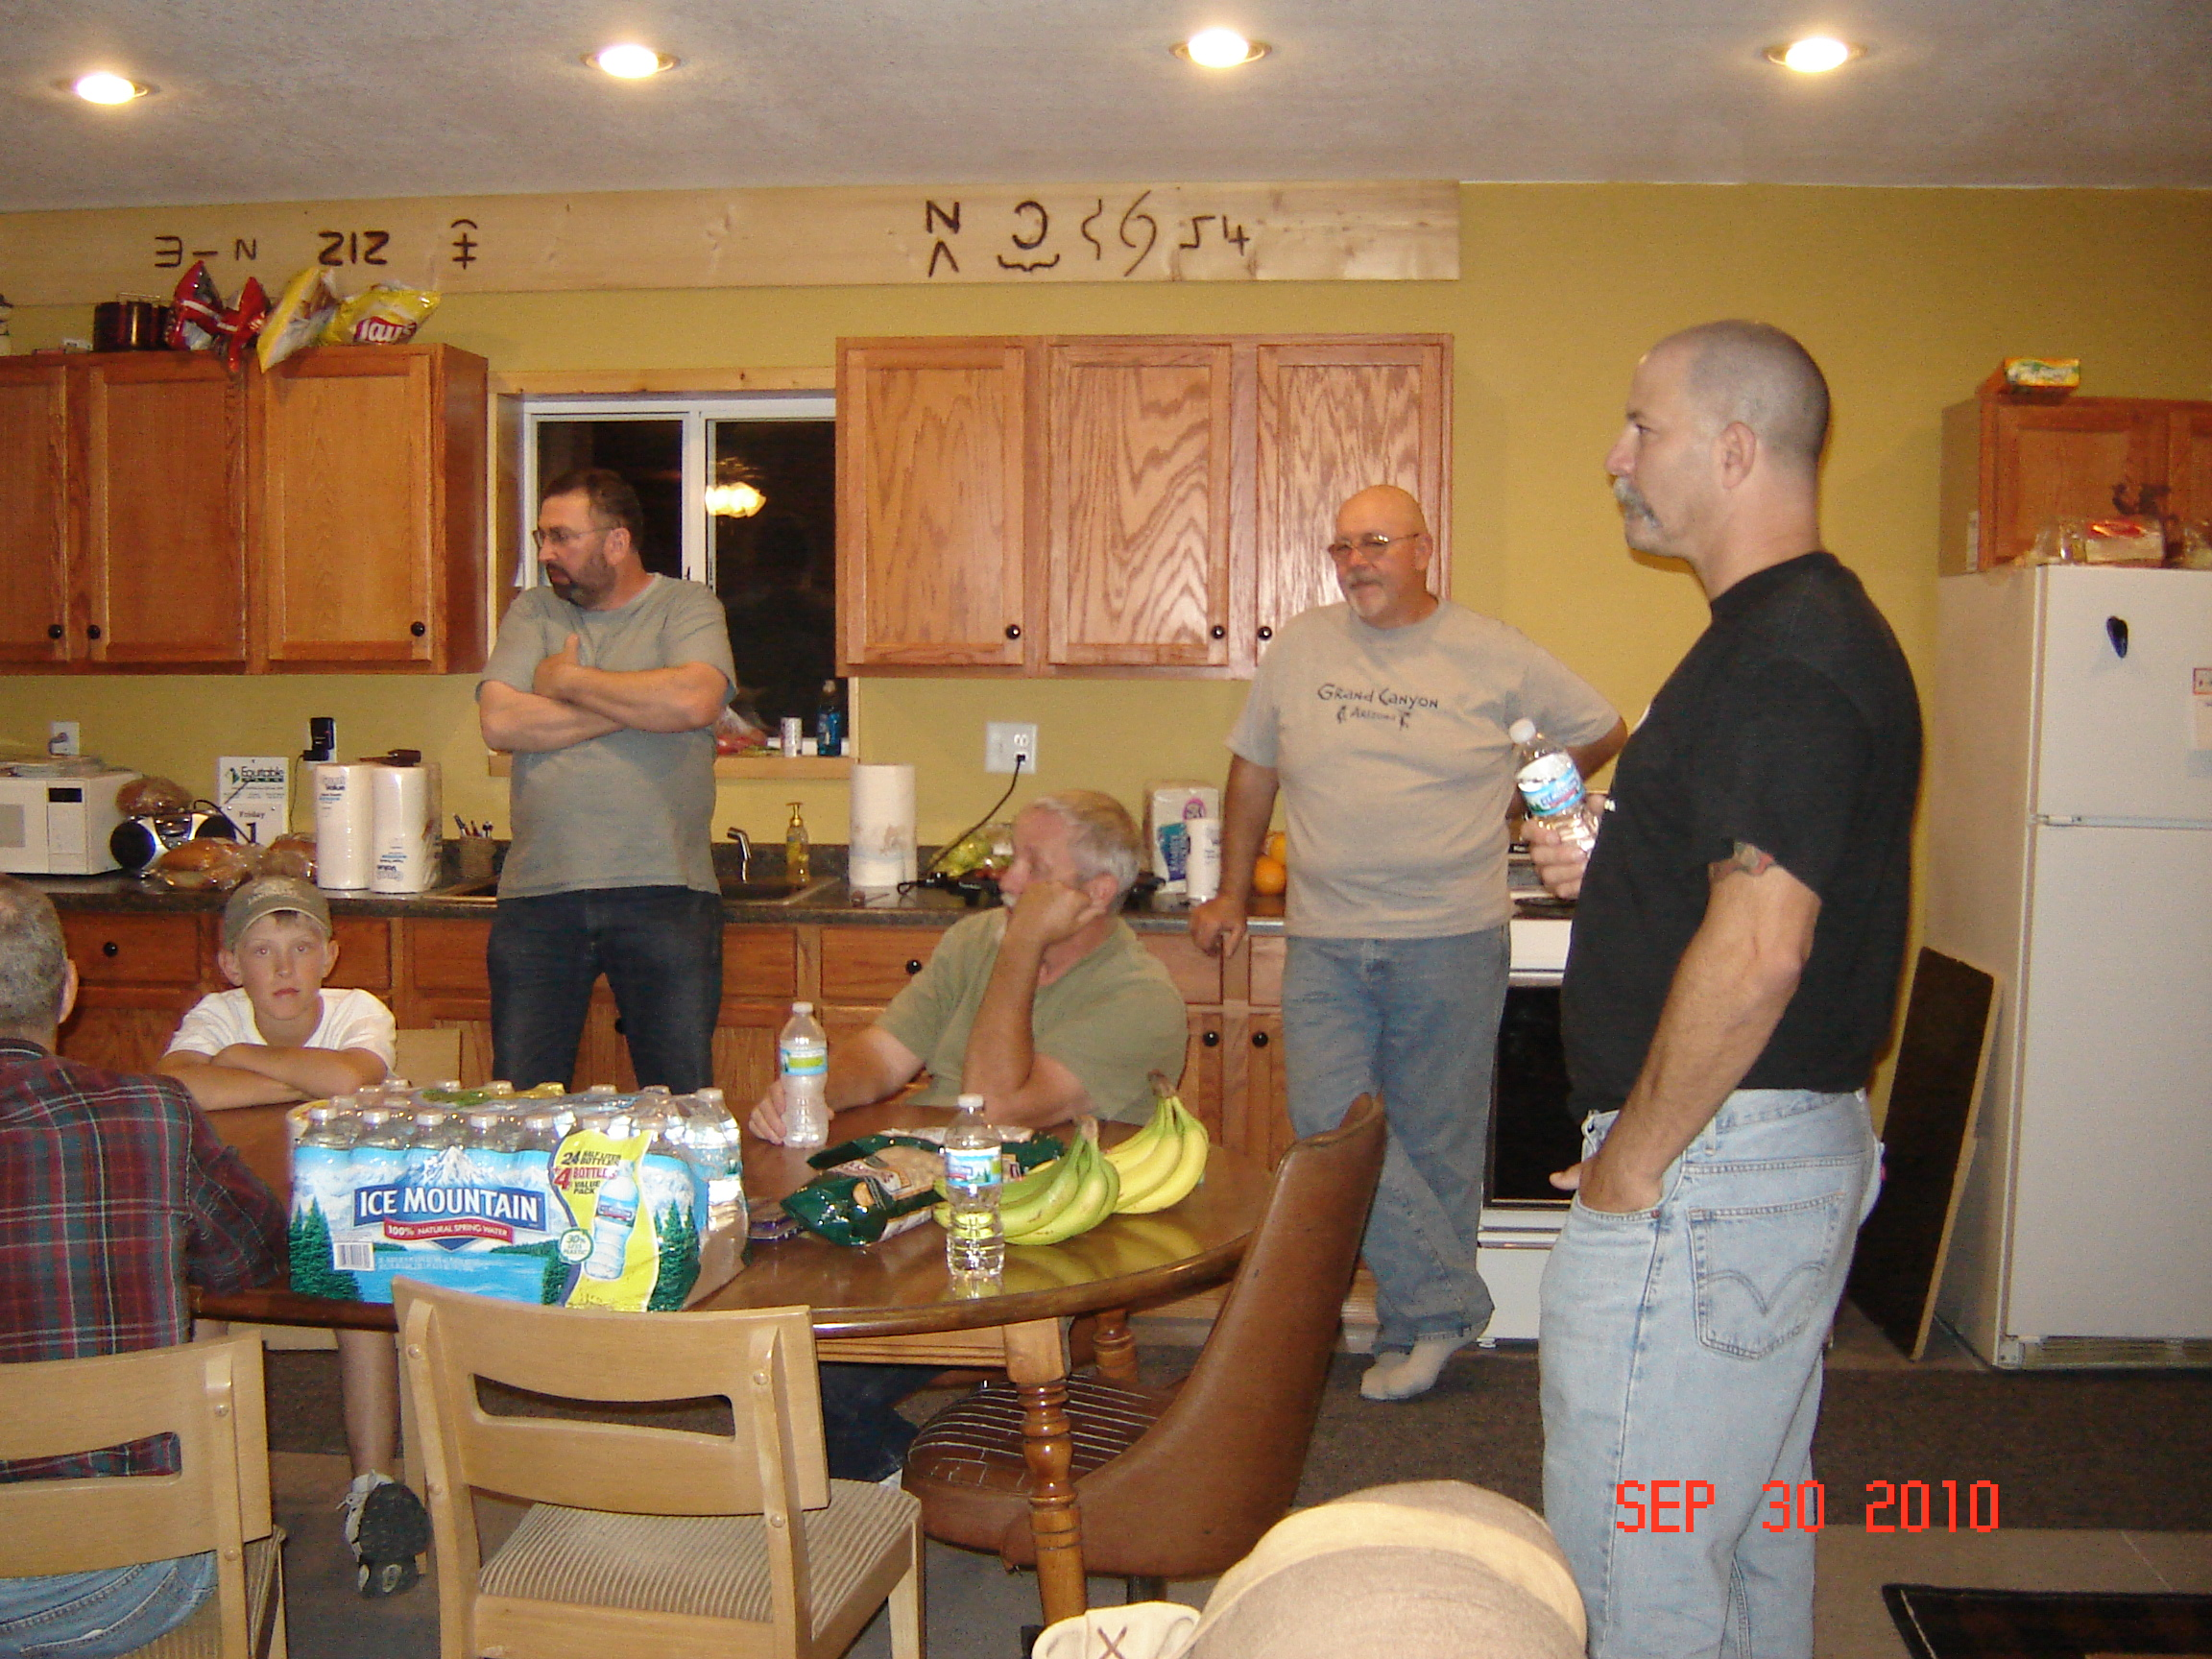 7-25-2010 006